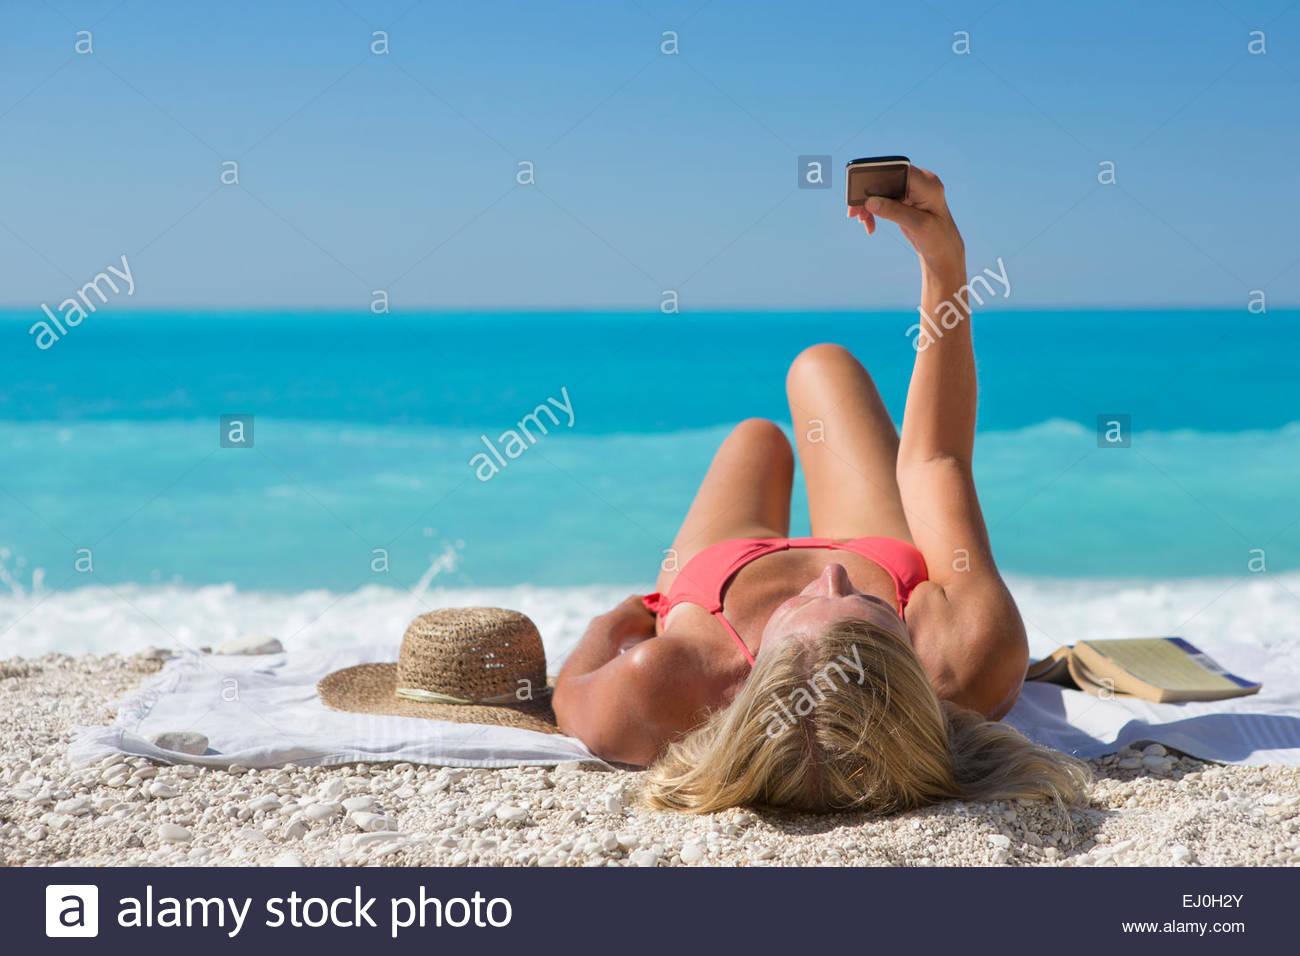 woman, taking selfie, lying on towel on sunny beach - Stock Image